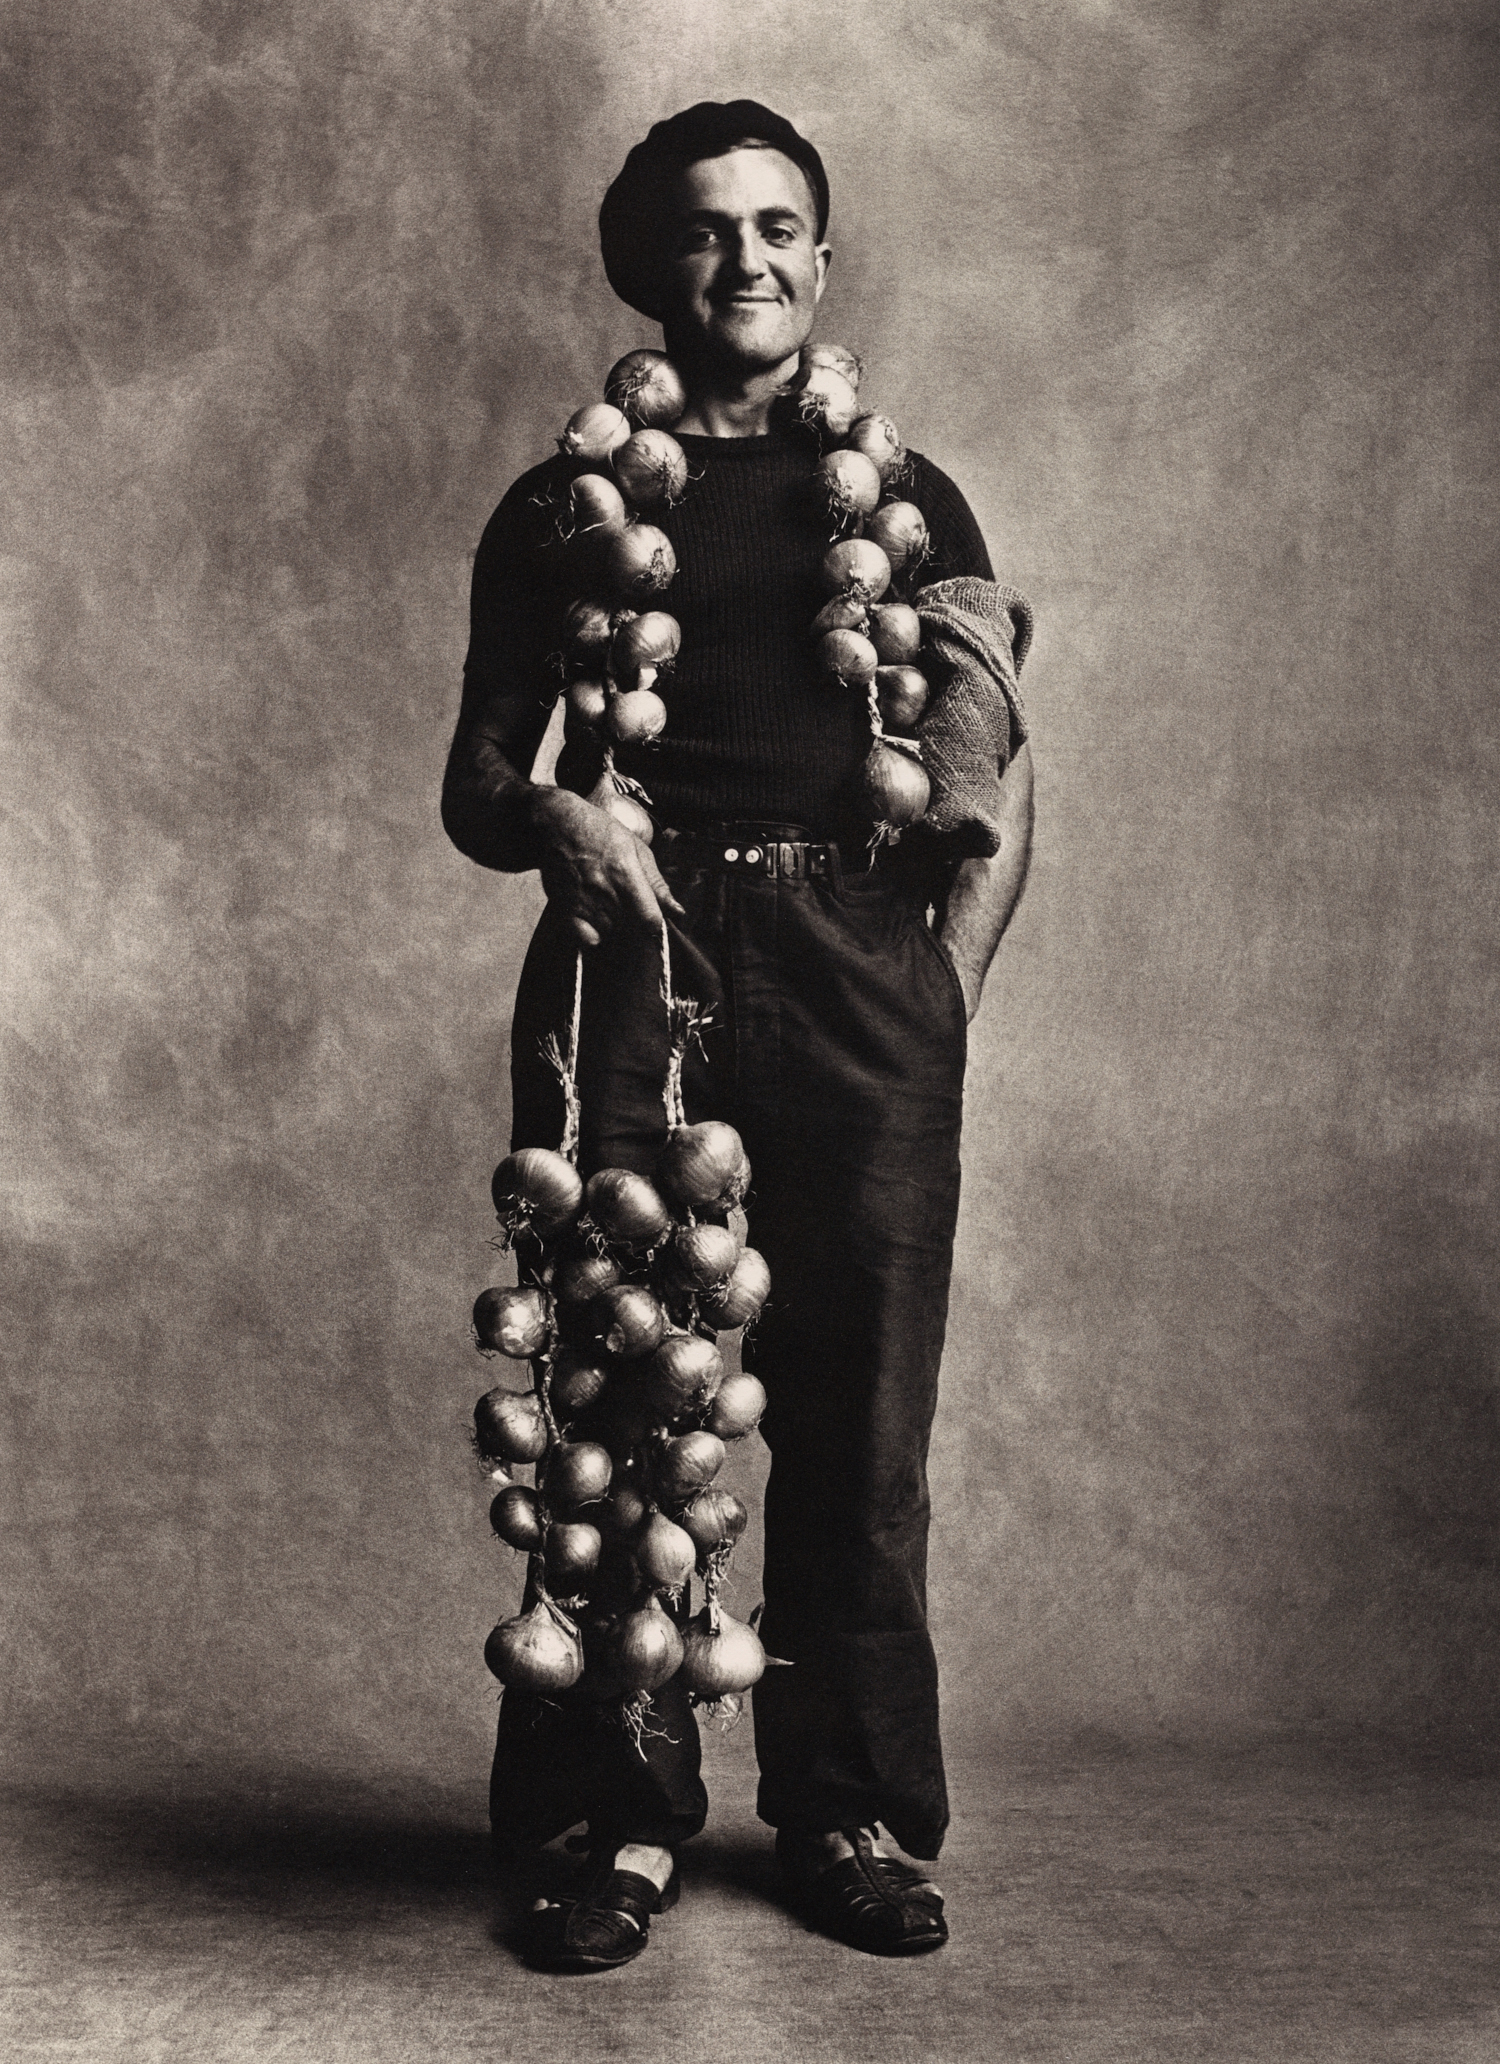 Breton Onion Seller , London, 1950 Platinum-palladium print © The Irving Penn Foundation